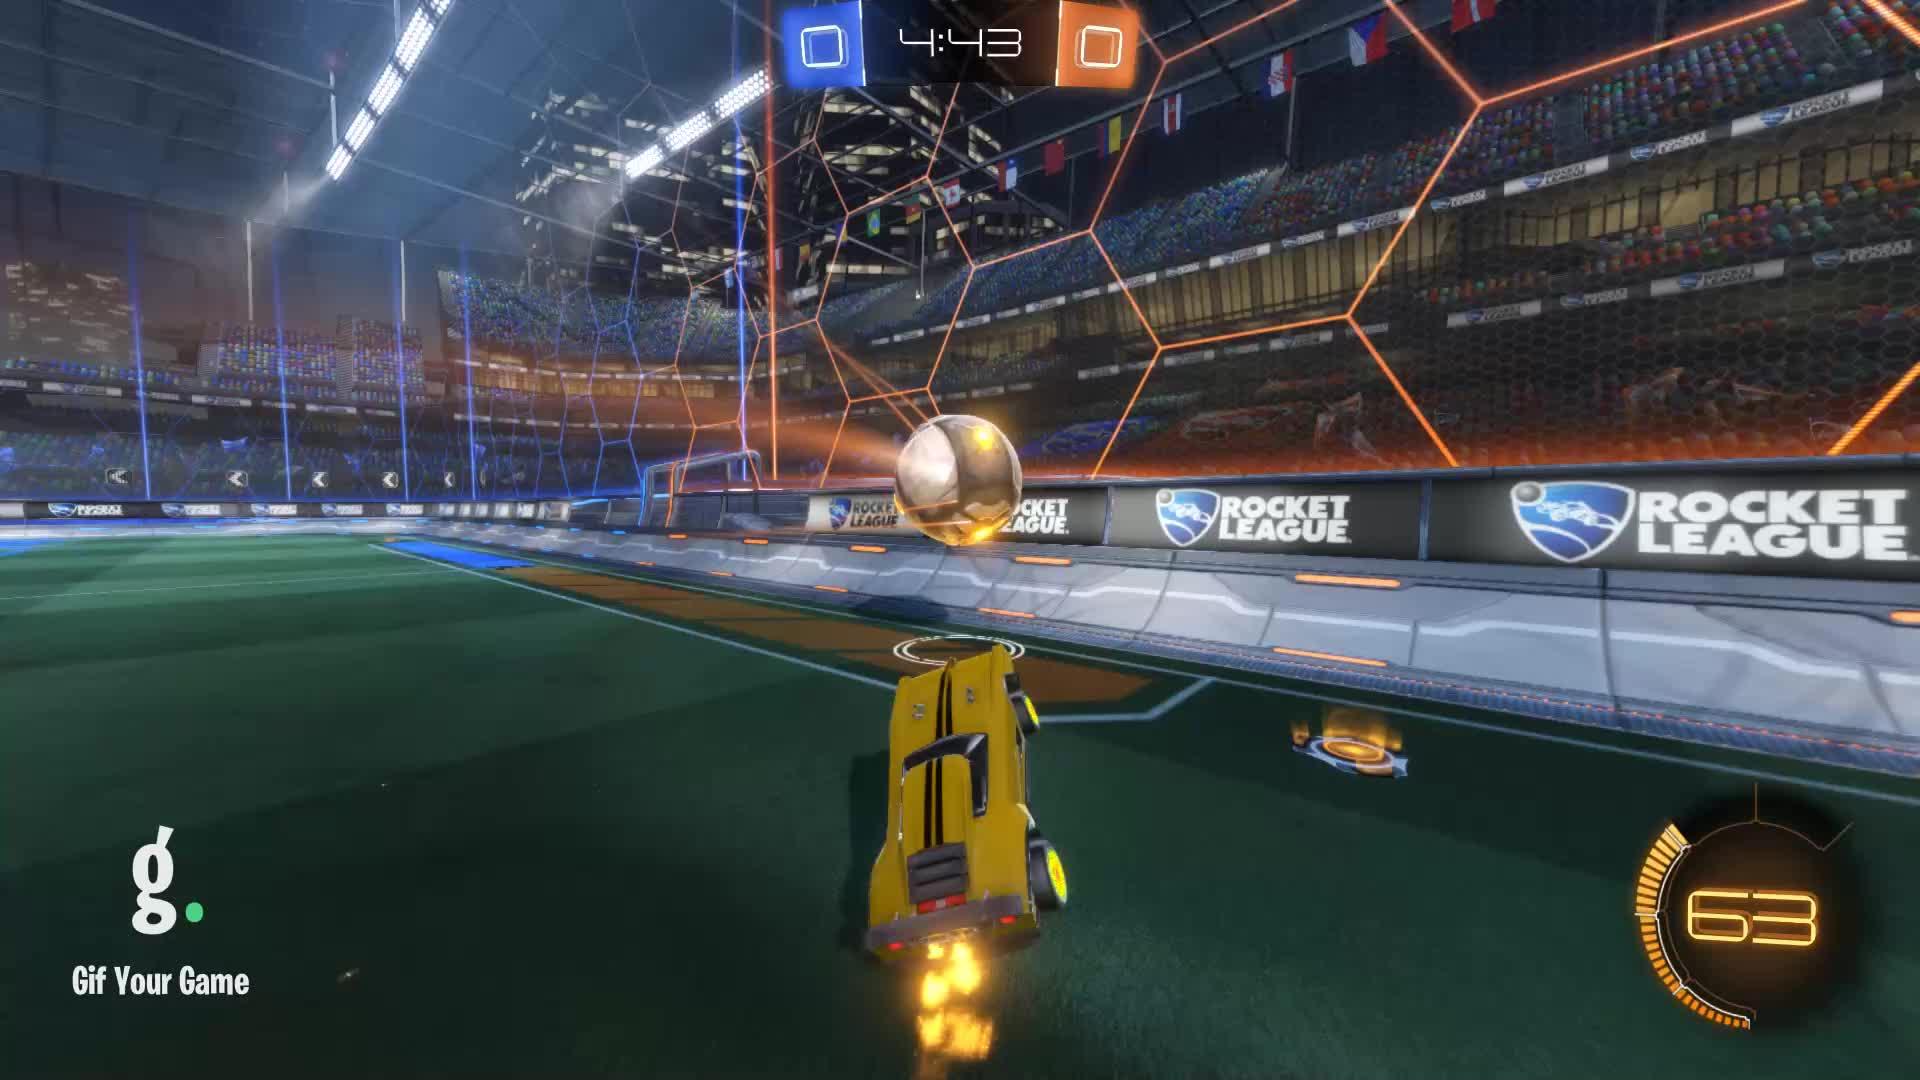 Gif Your Game, GifYourGame, Rocket League, RocketLeague, VEX Nexus, Goal 1: VEX Nexus GIFs